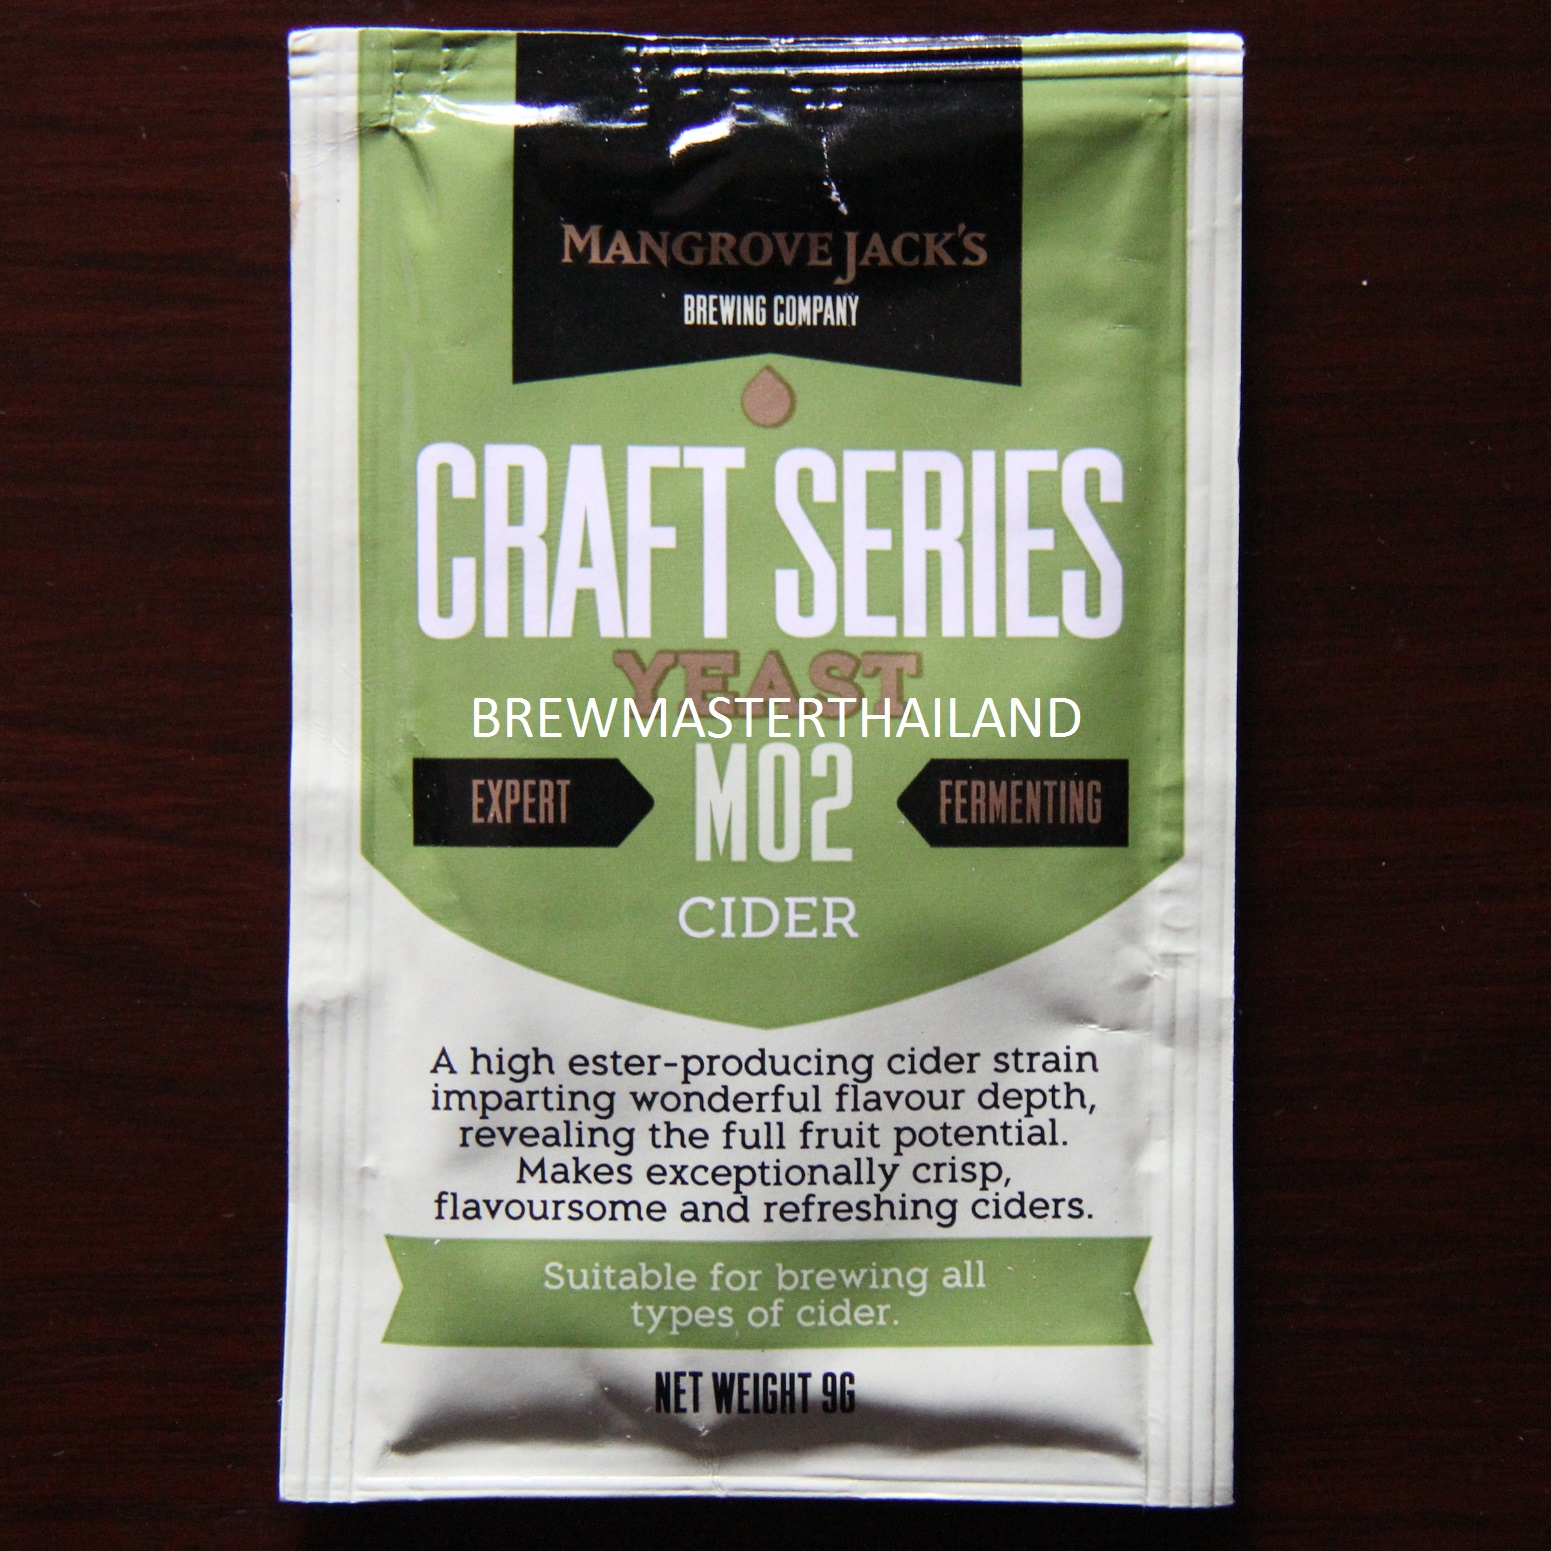 Mangrove Jack's - M02 Cider yeast